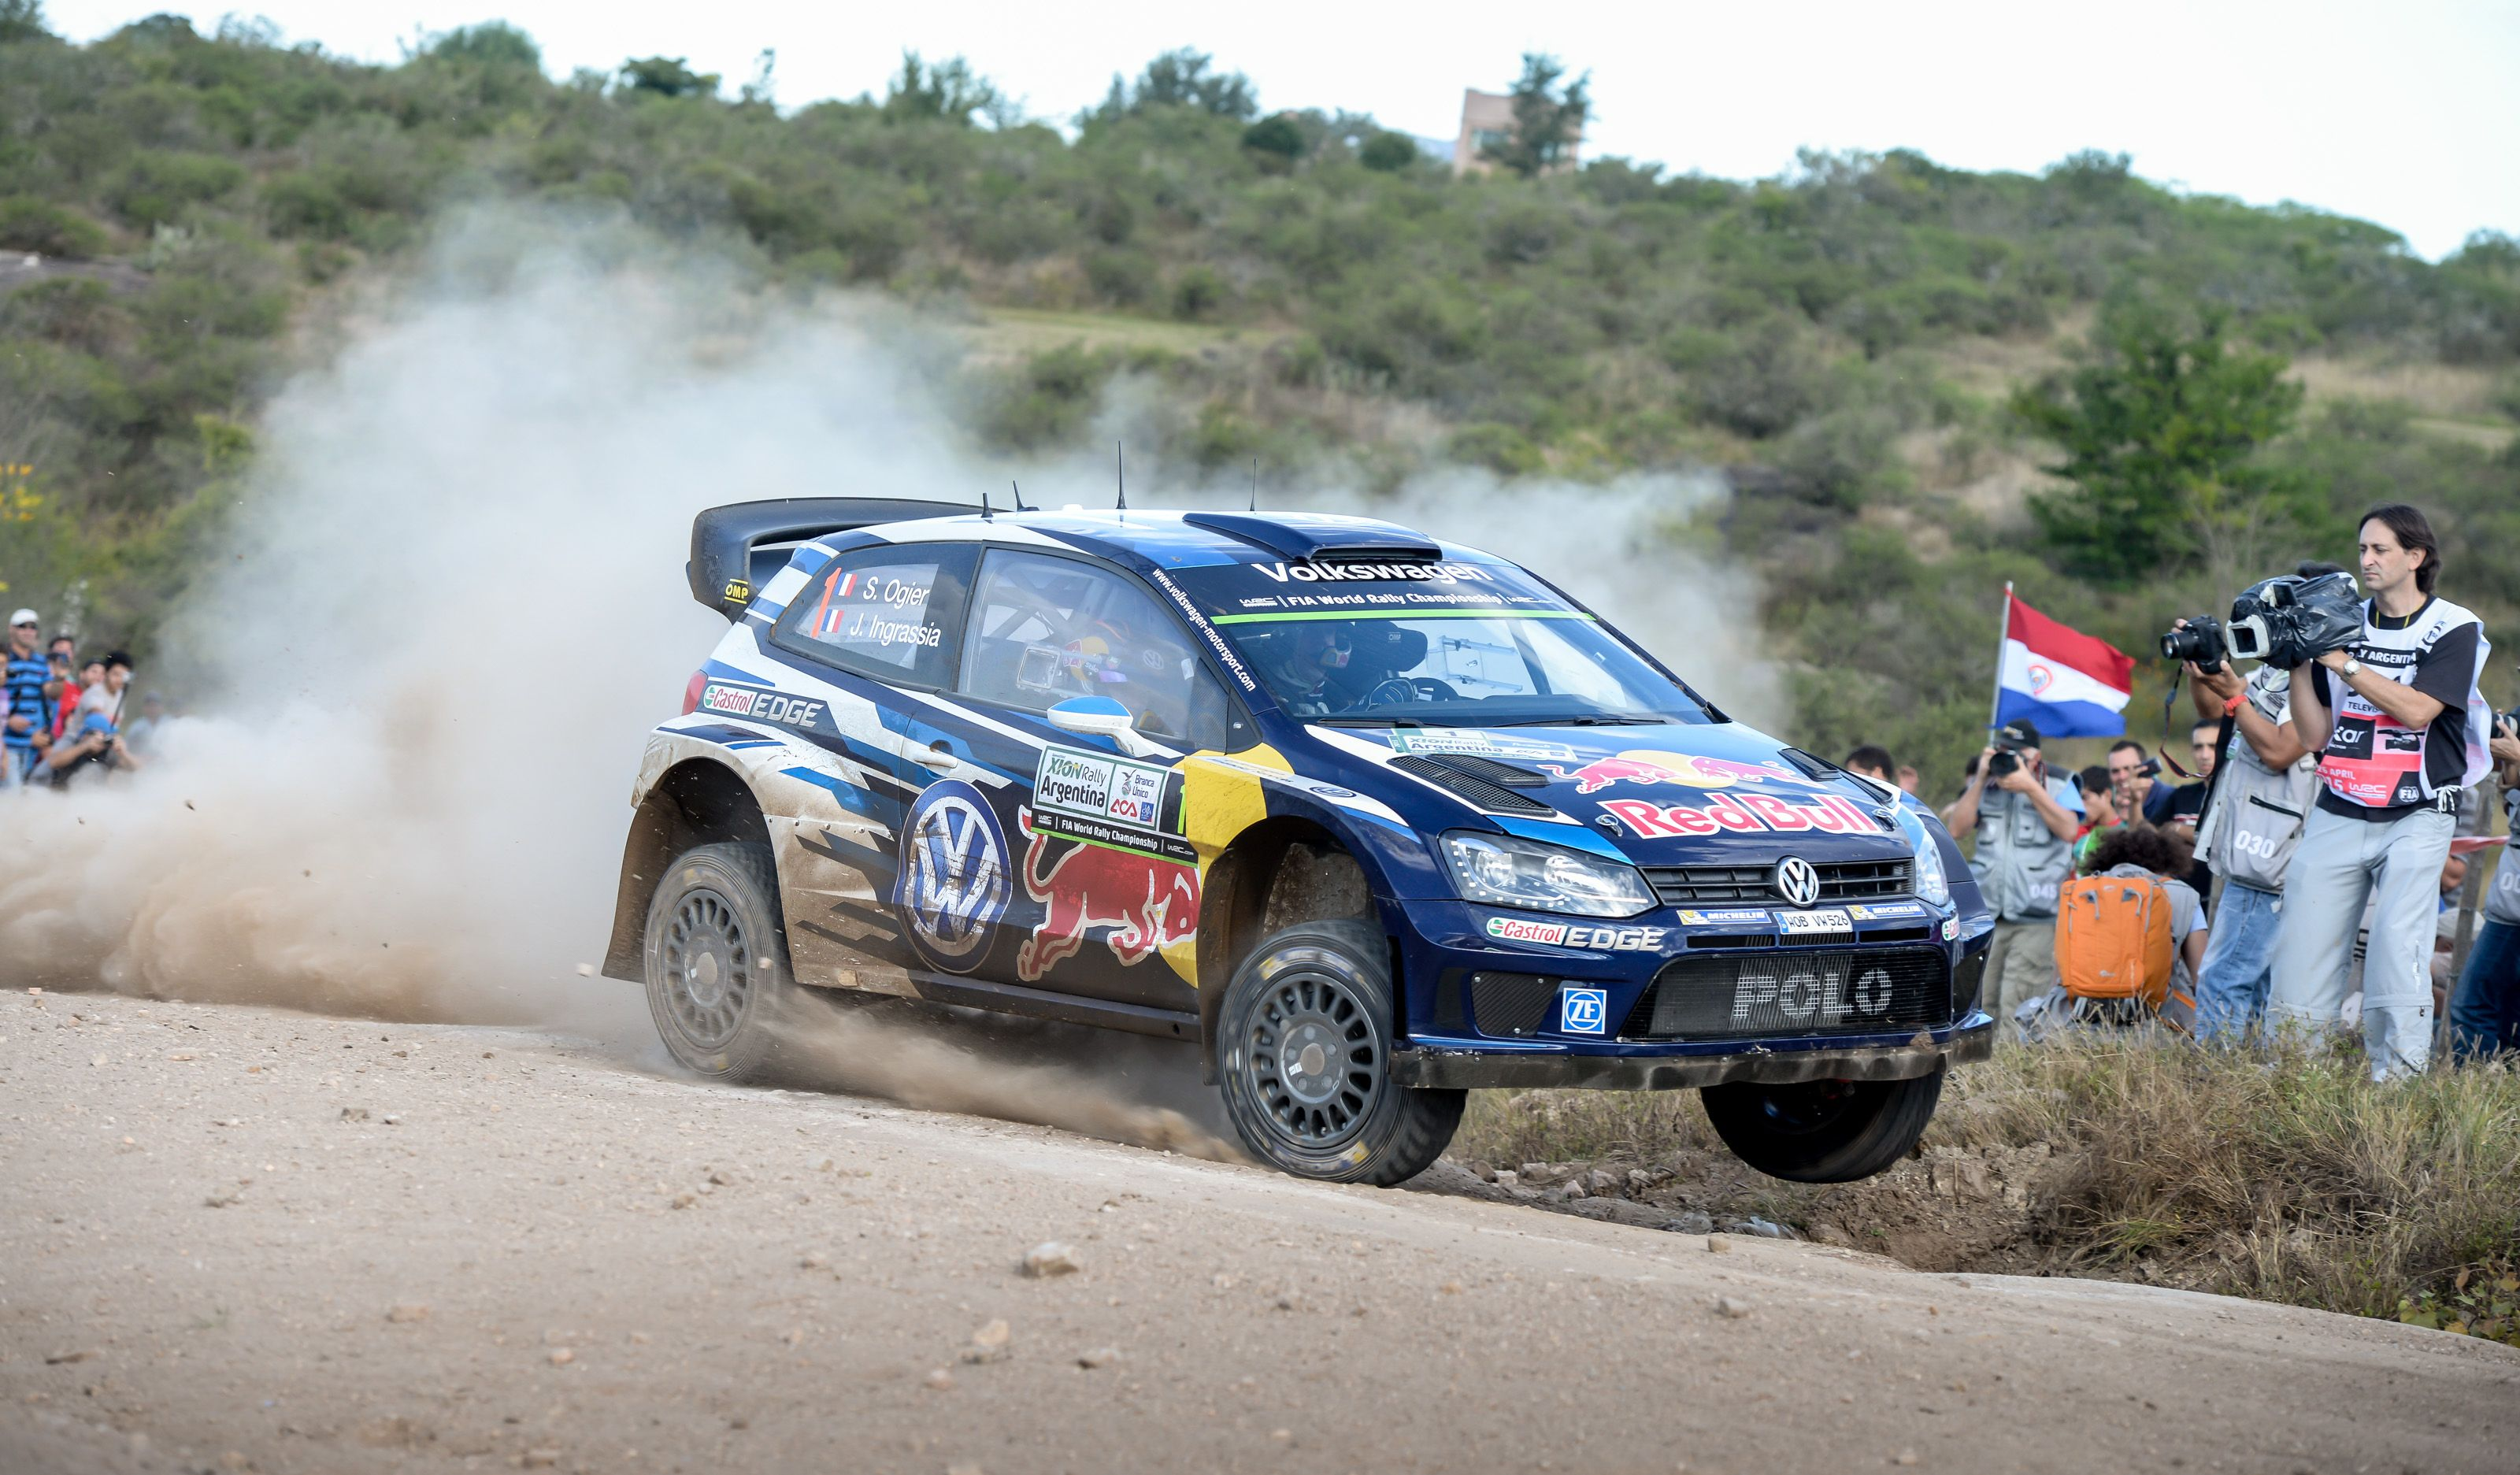 Rally Argentino 2015: Mikkelsen gana el tramo y Ostberg se acerca a Meeke